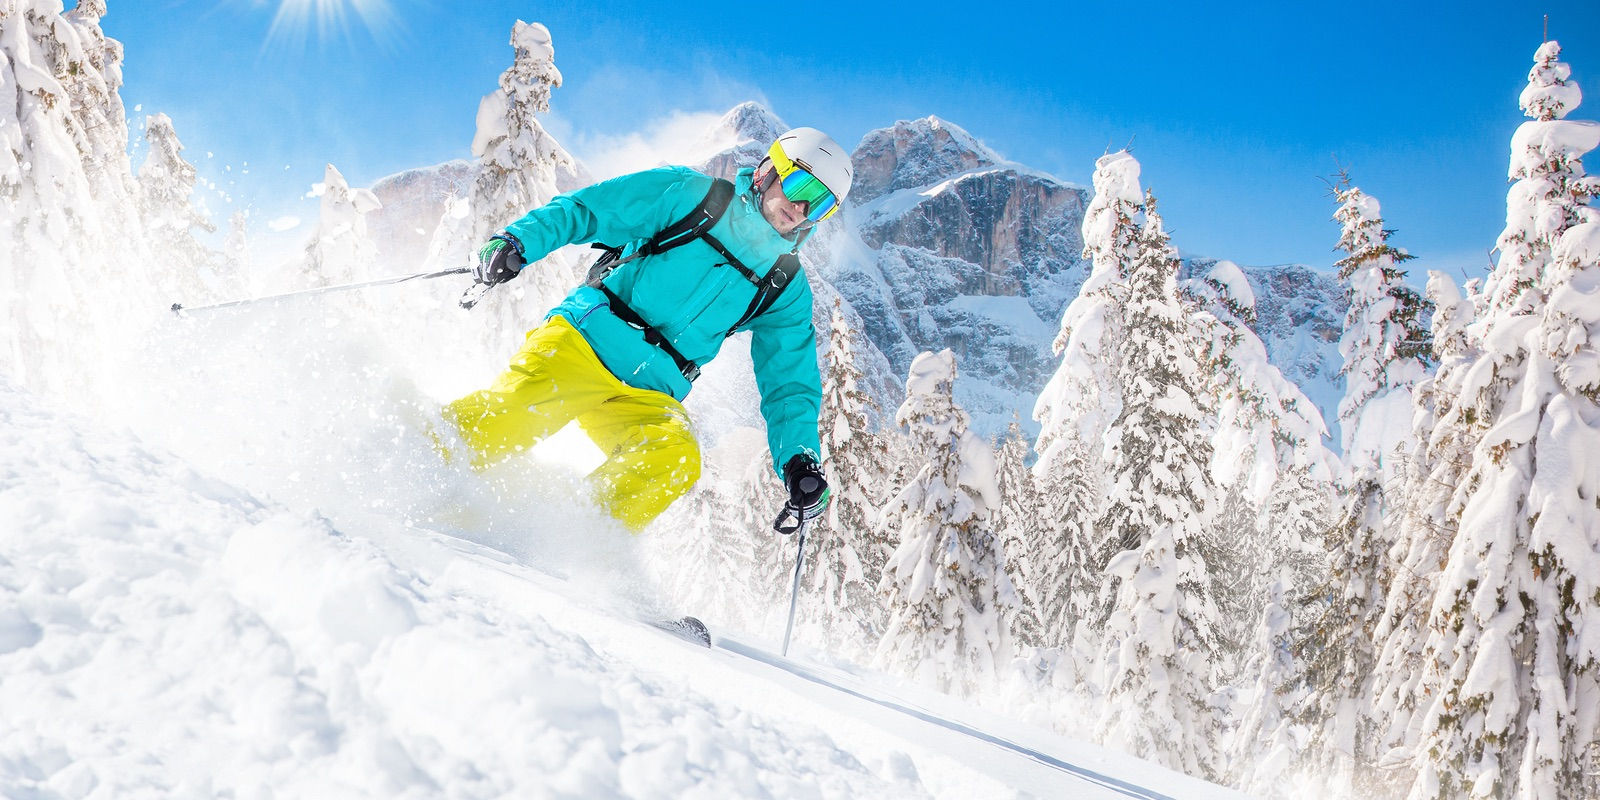 Choosing ski pin bindings for your knees